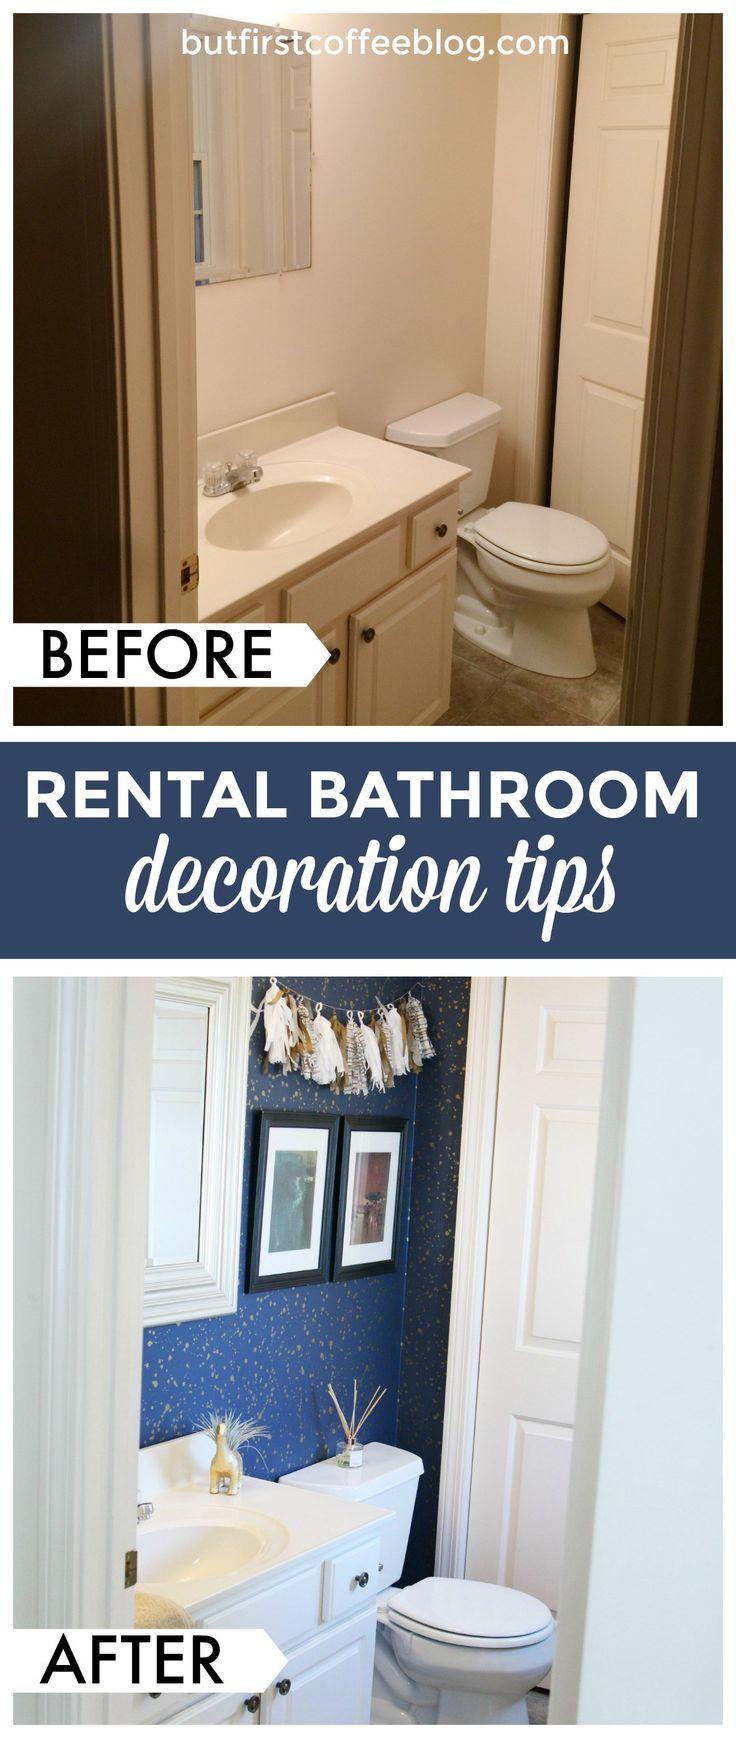 Apartment bathroom decorating - How To Decorate Your Rental Space Bathroom Rental Decor